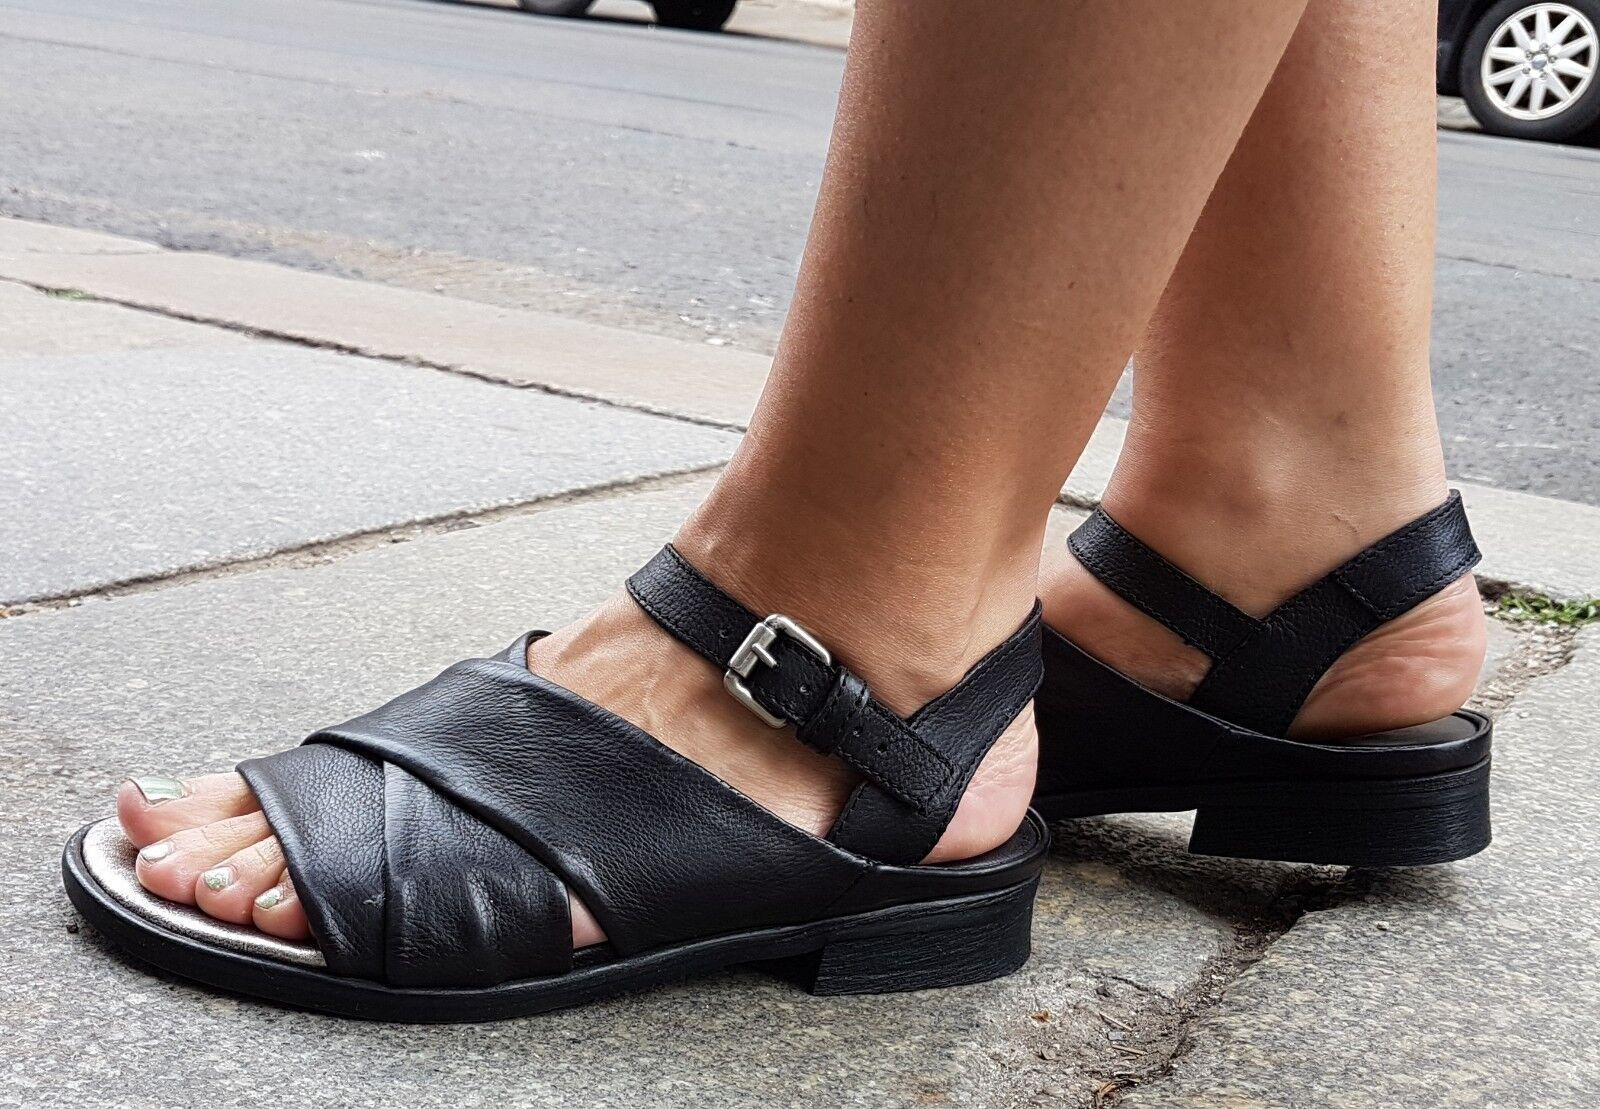 Mjus sandalia art.779001 negro Black Echt Leder nuevo orginal Made in Italy